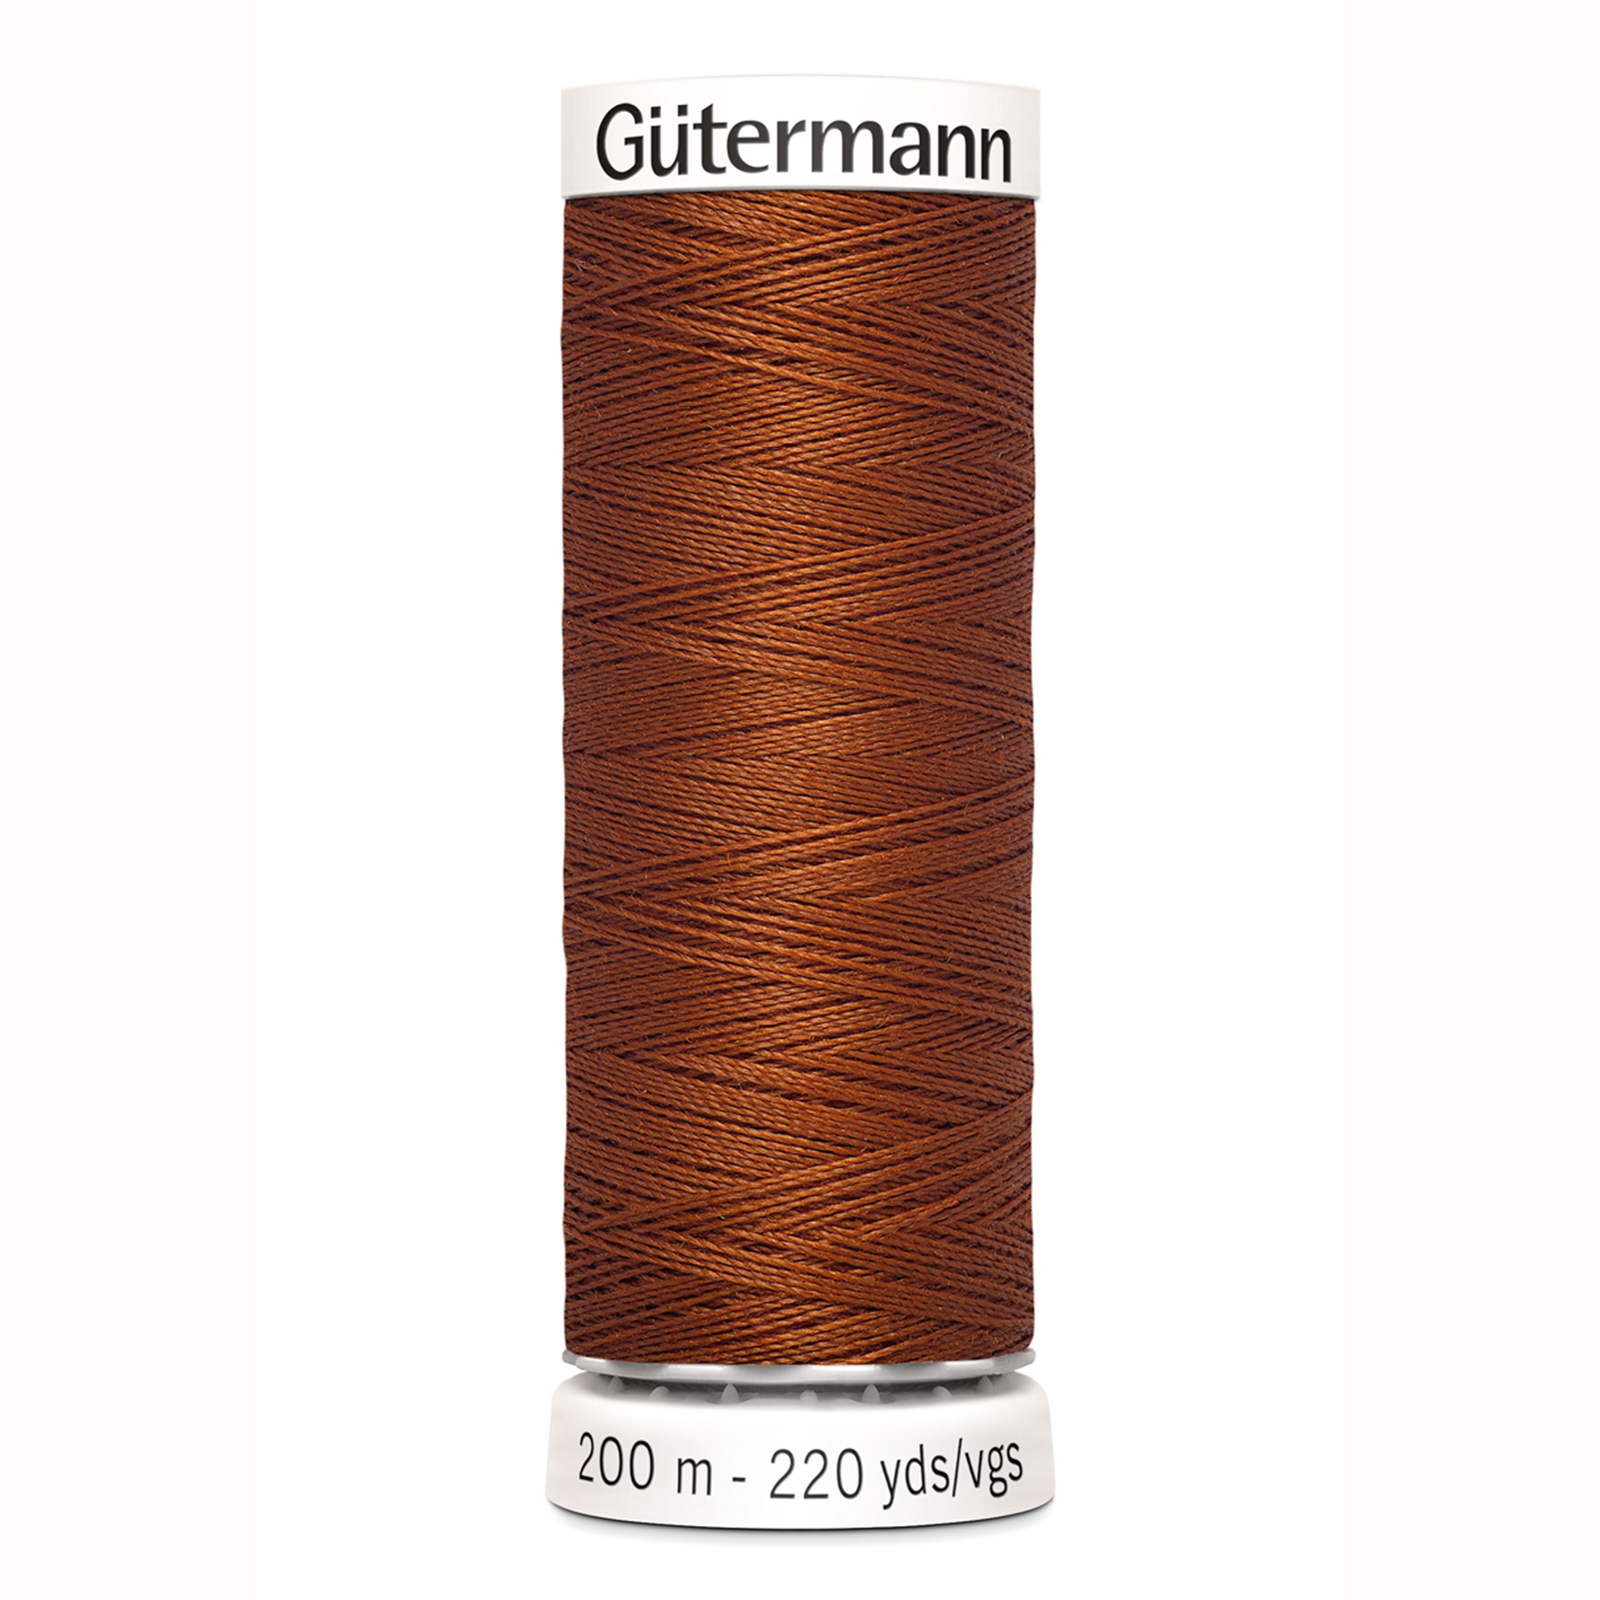 Gutermann Polyestr 200m-934